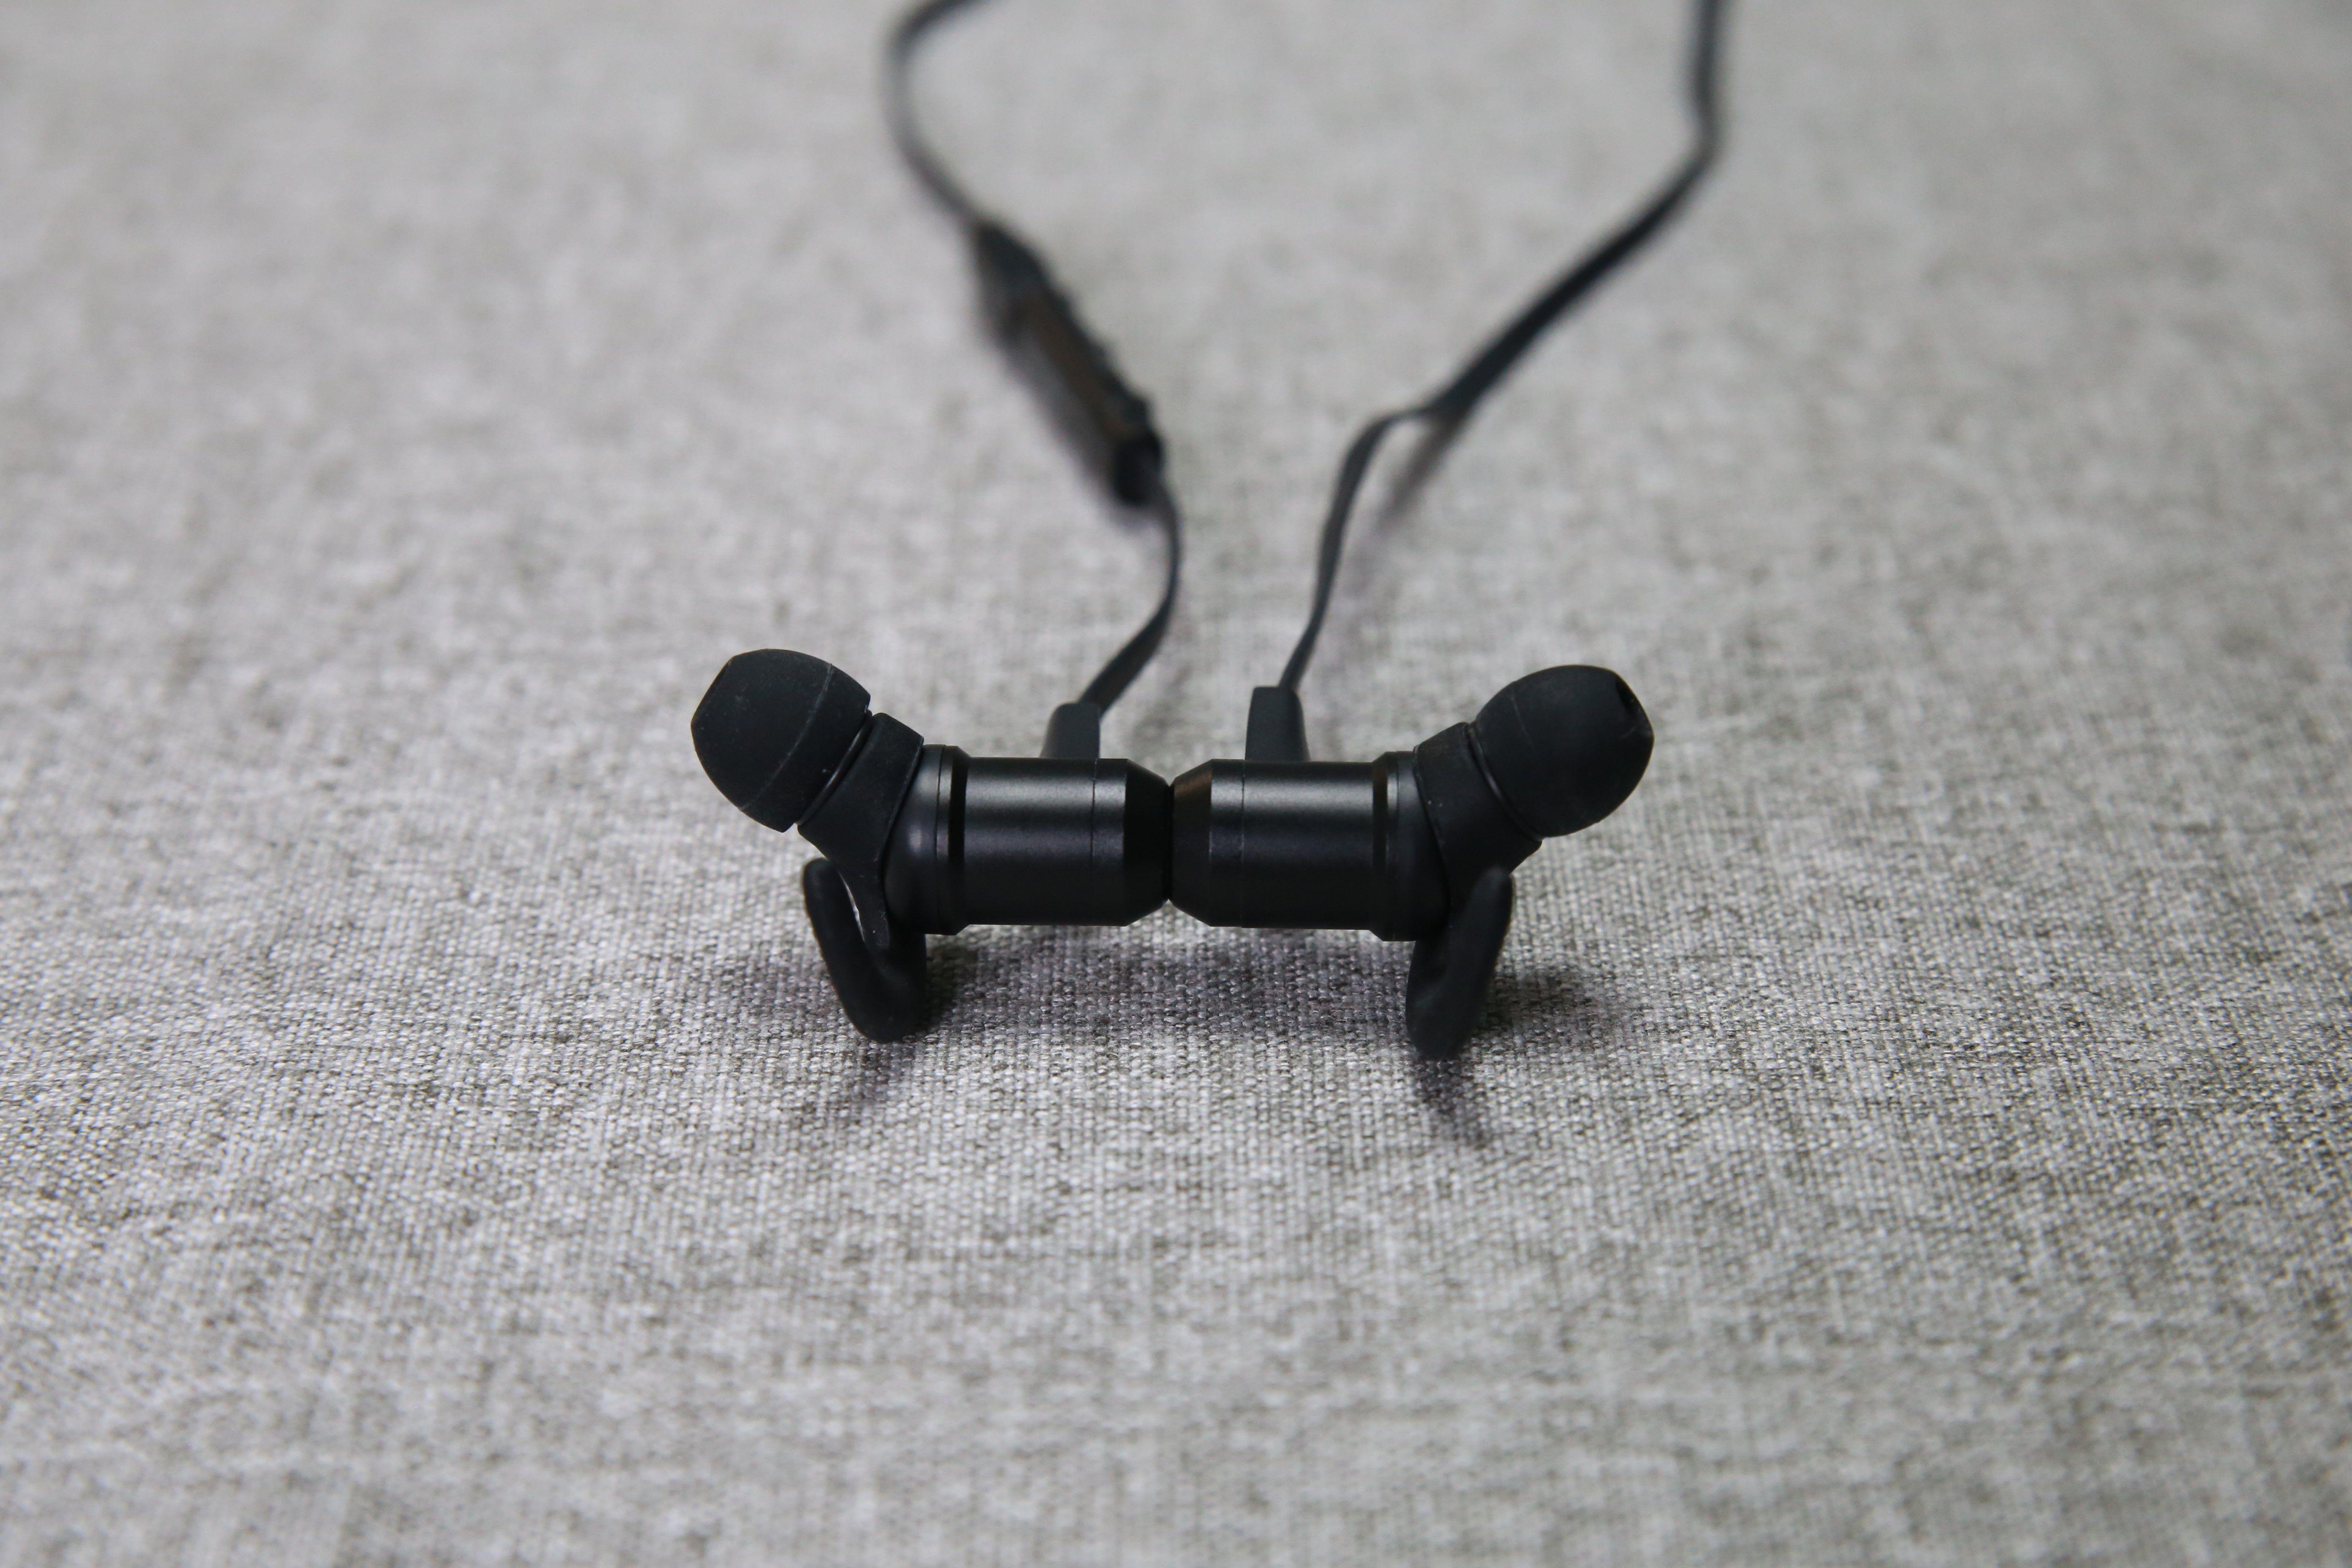 VAVA MOOV 28 磁吸藍牙耳機推薦 - 斜入耳式設計